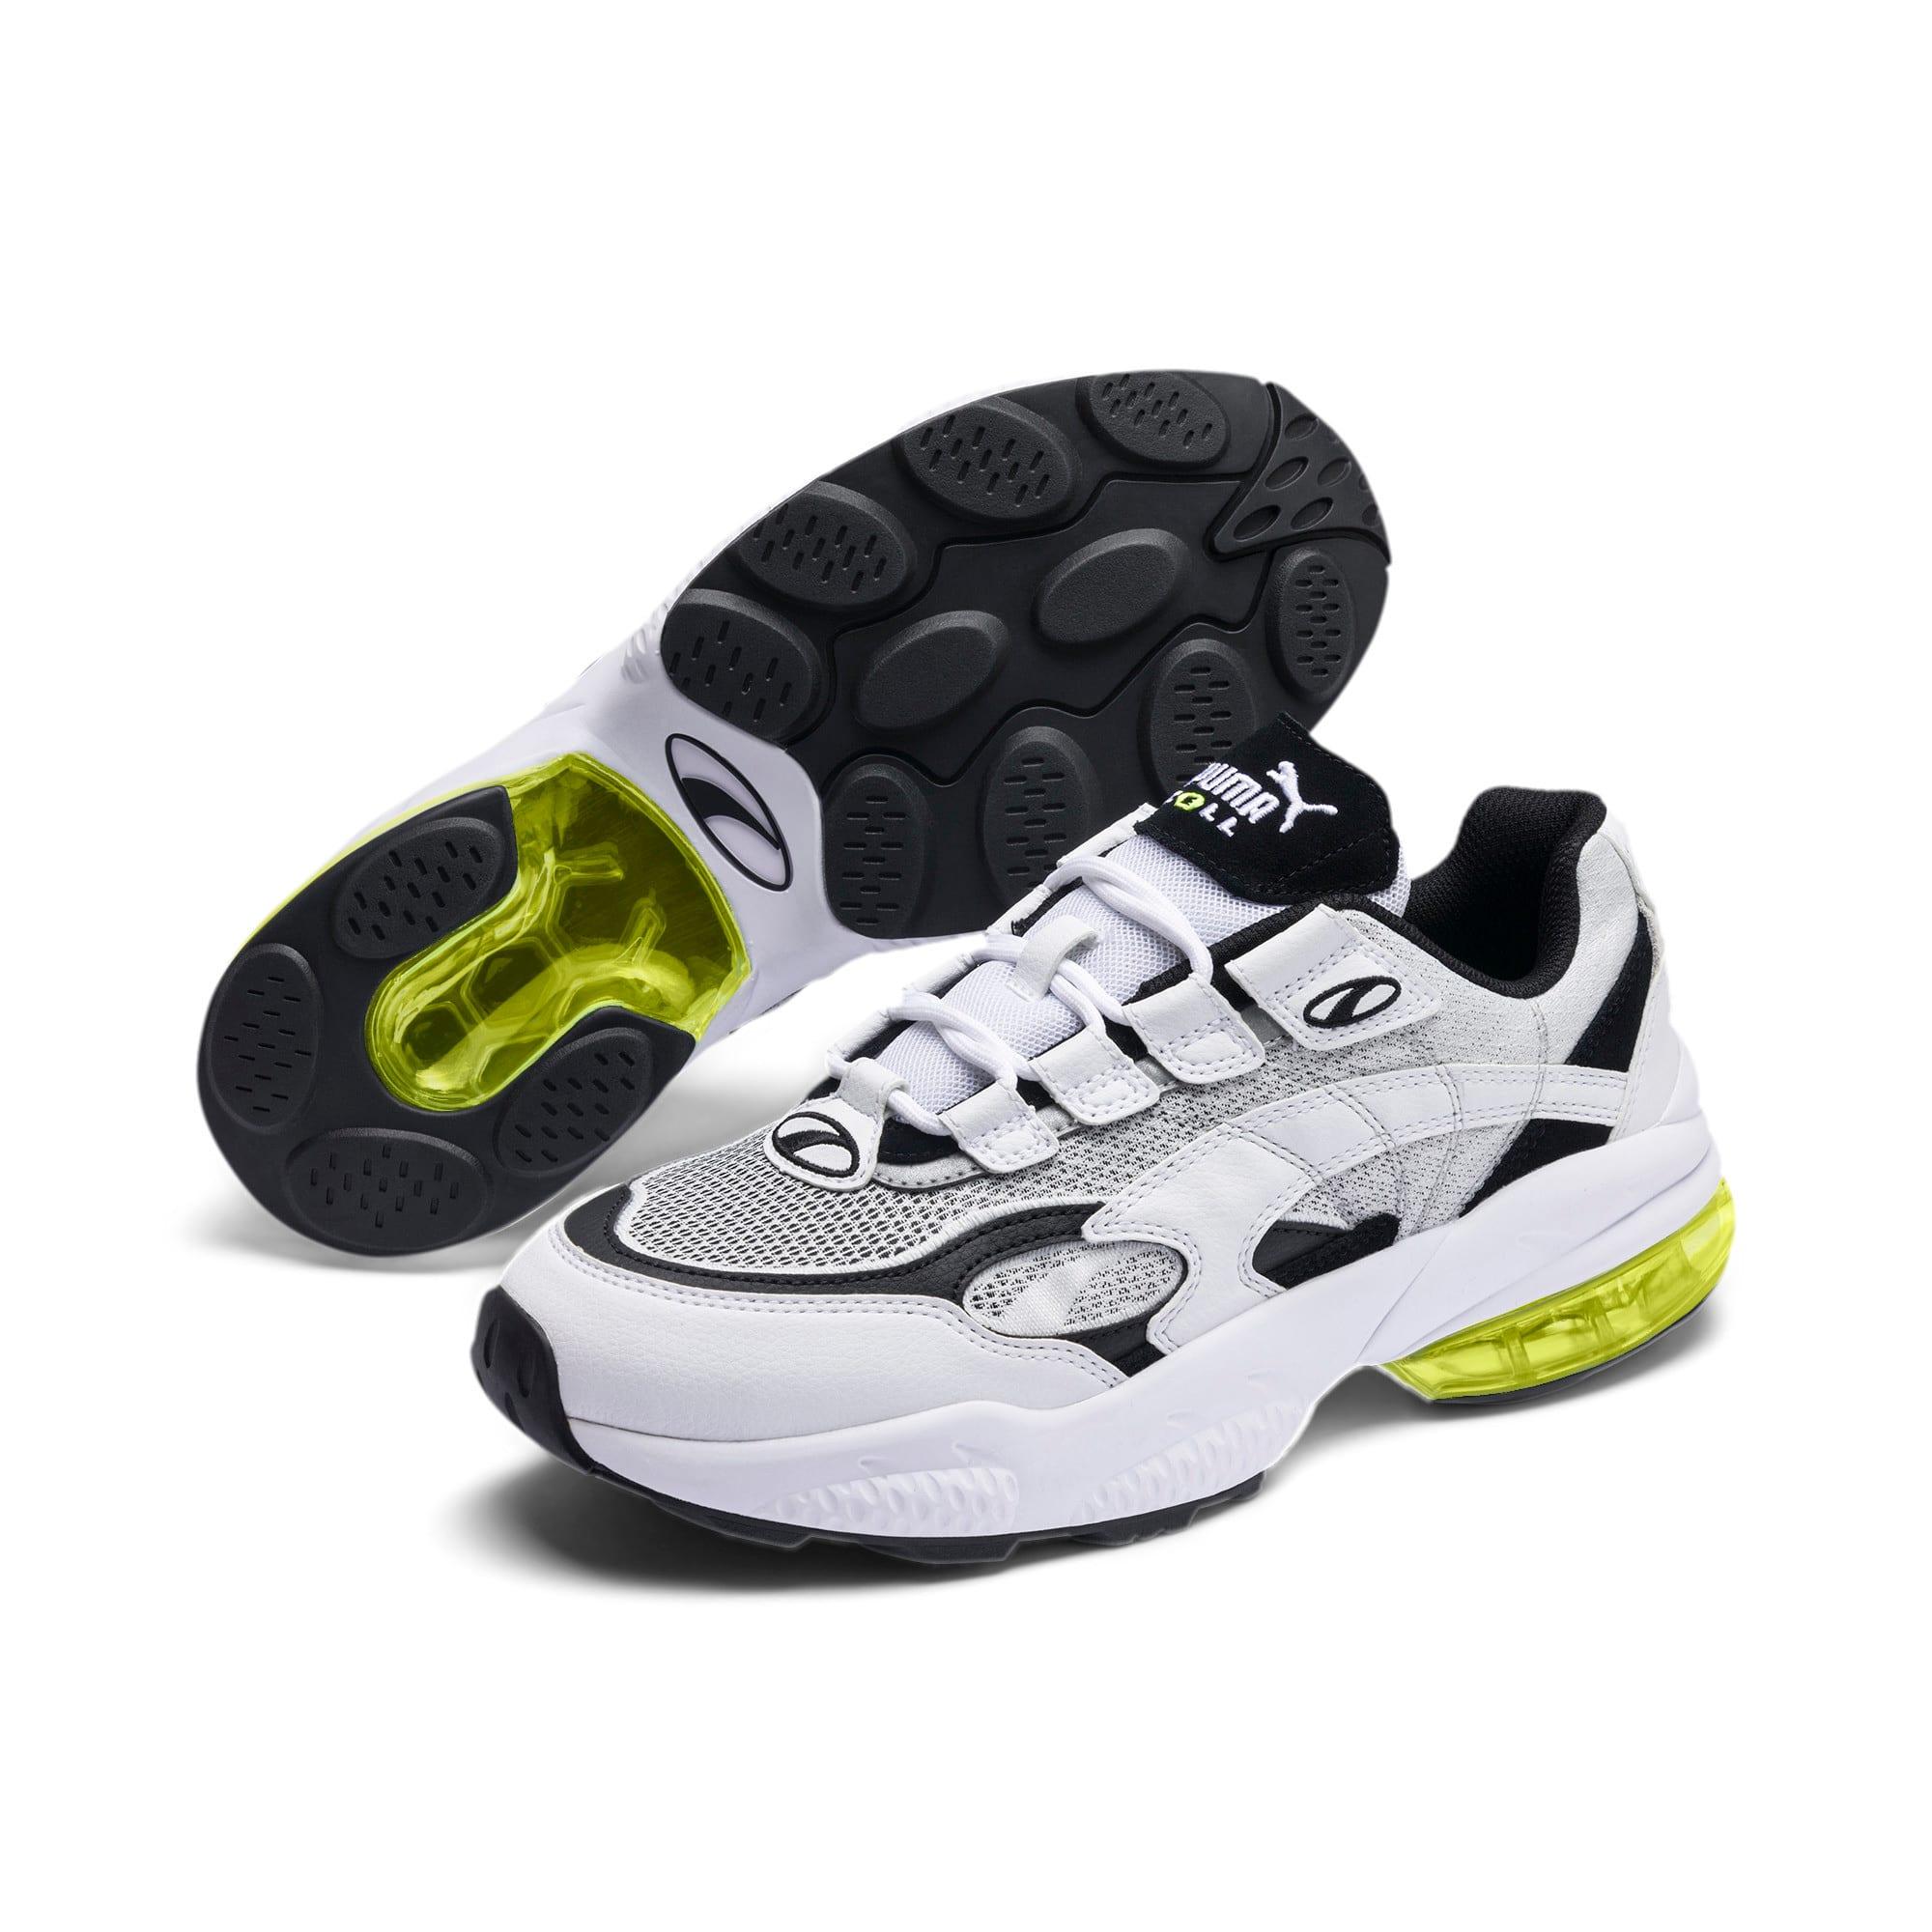 Thumbnail 3 of CELL Venom Alert Sneakers, Puma White-Puma Black, medium